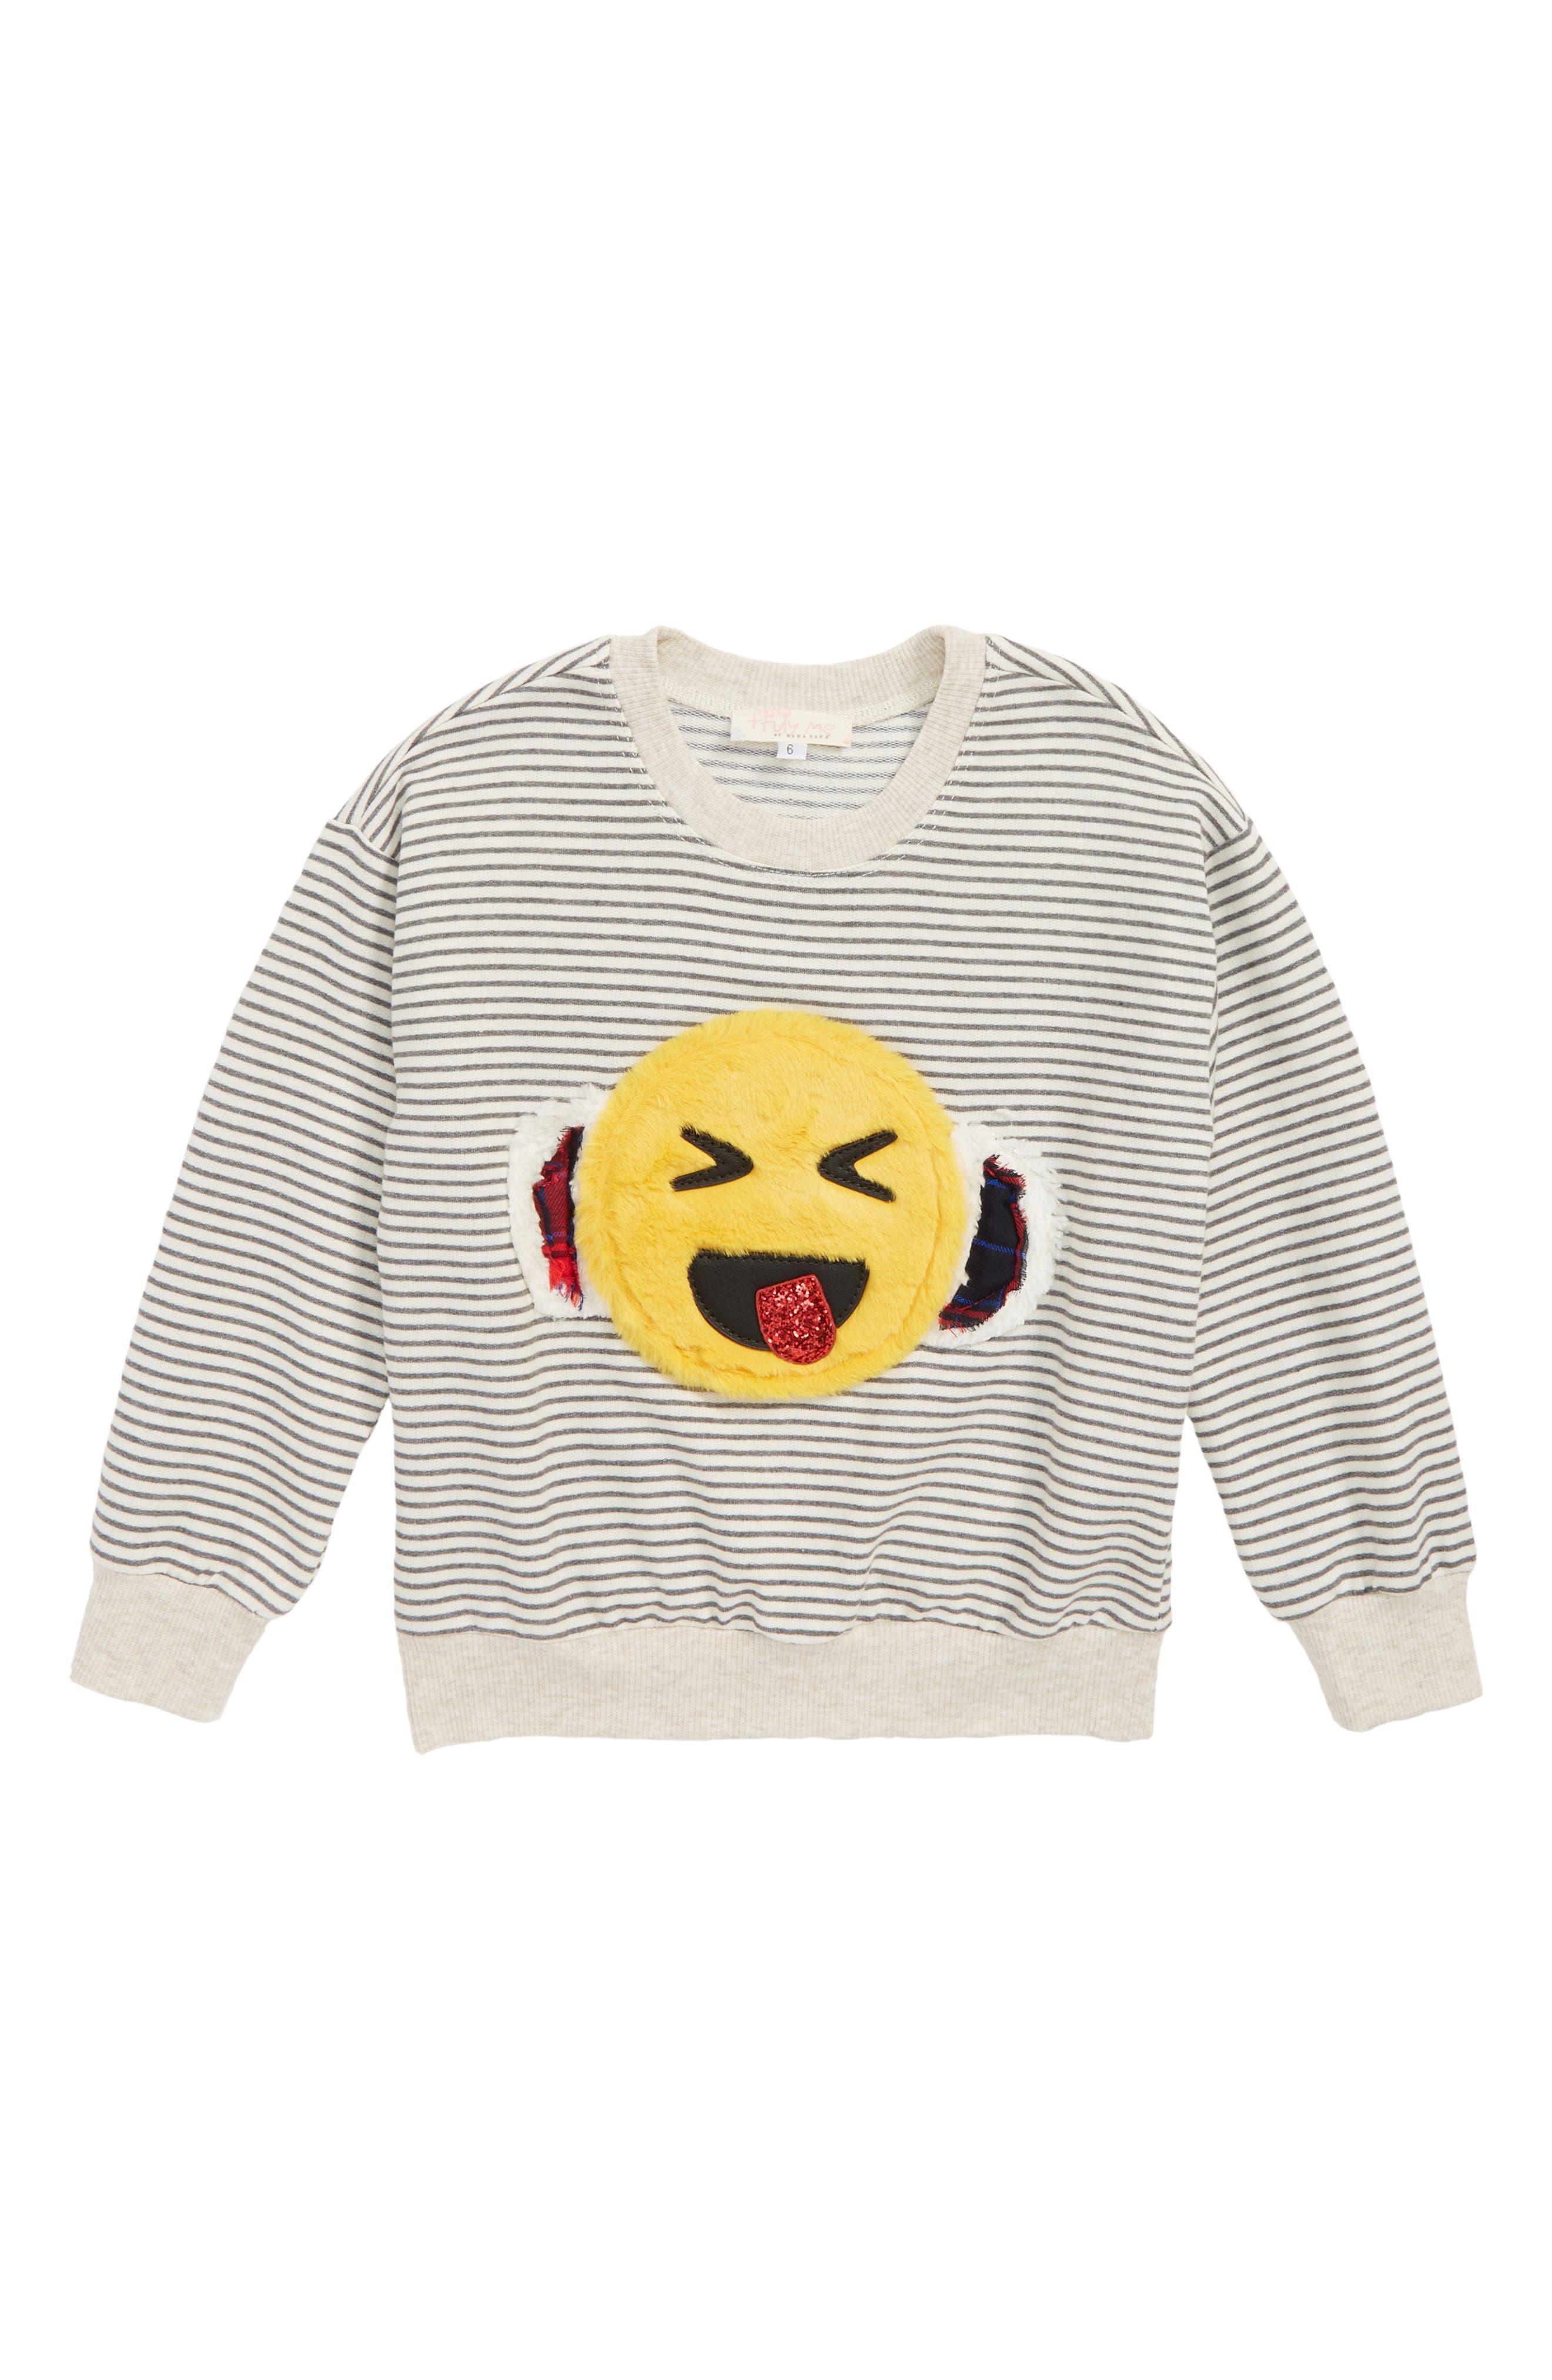 TRULY ME Faux Fur Emoji Stripe Sweatshirt, Main, color, 065